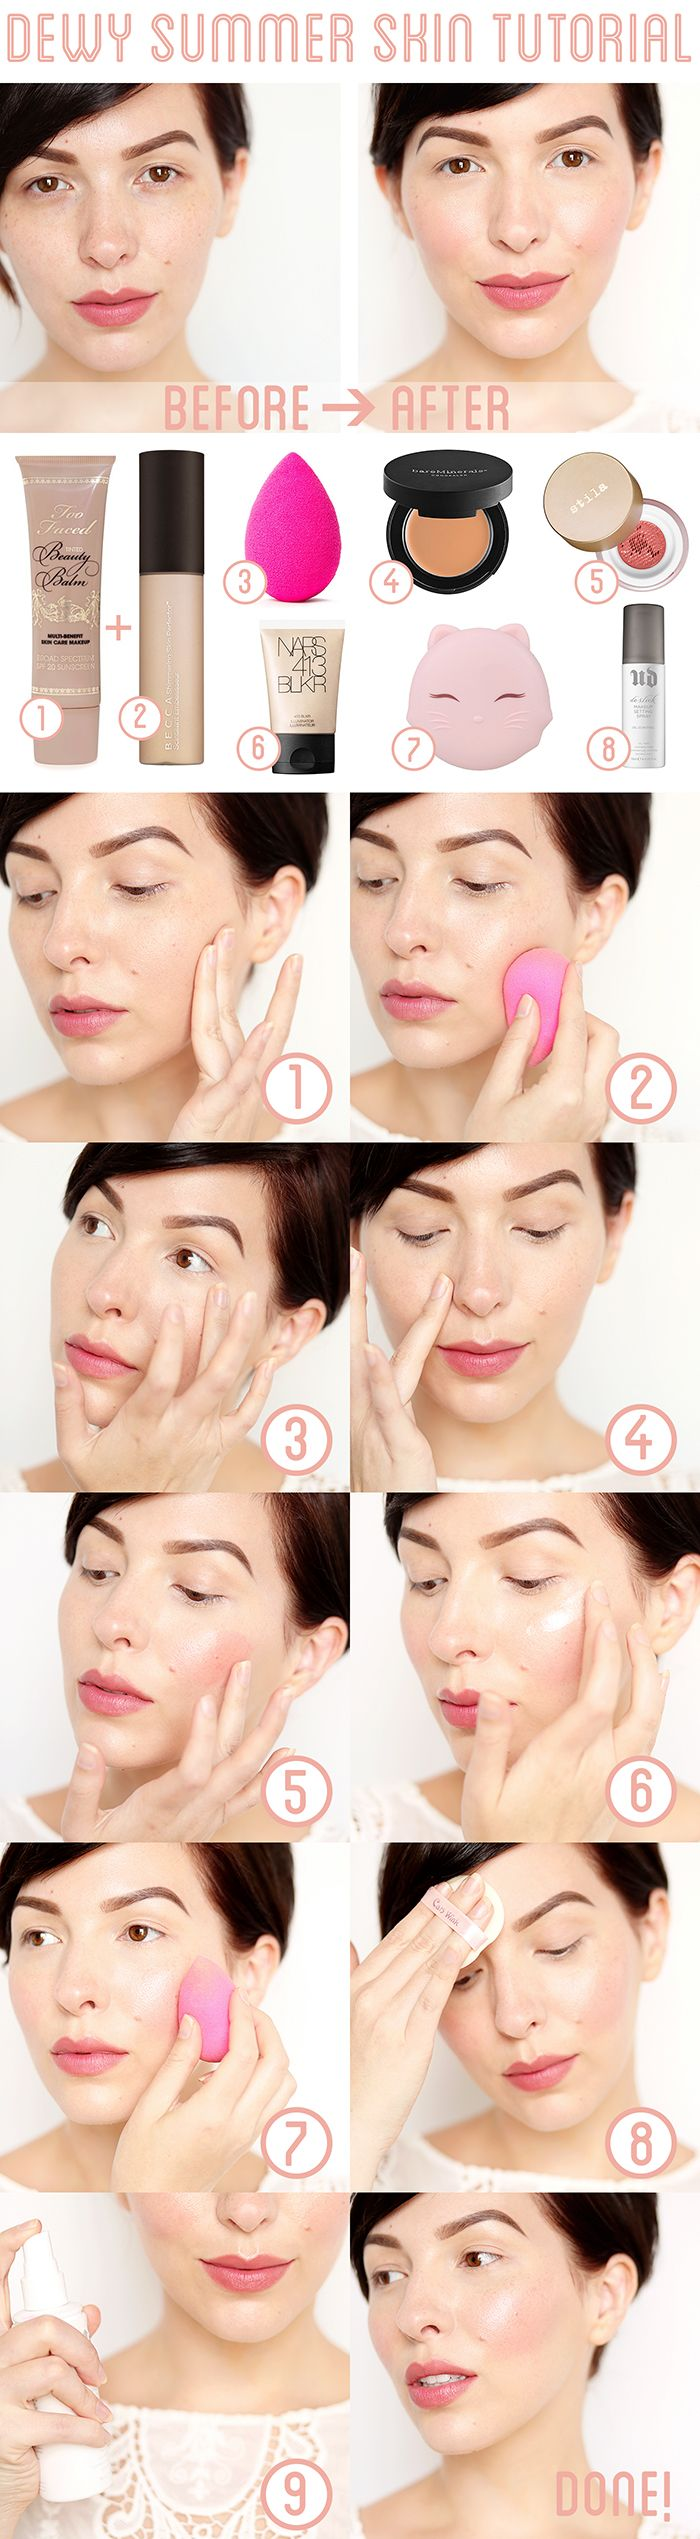 Makeup Monday: Dewy Summer Skin Tutorial